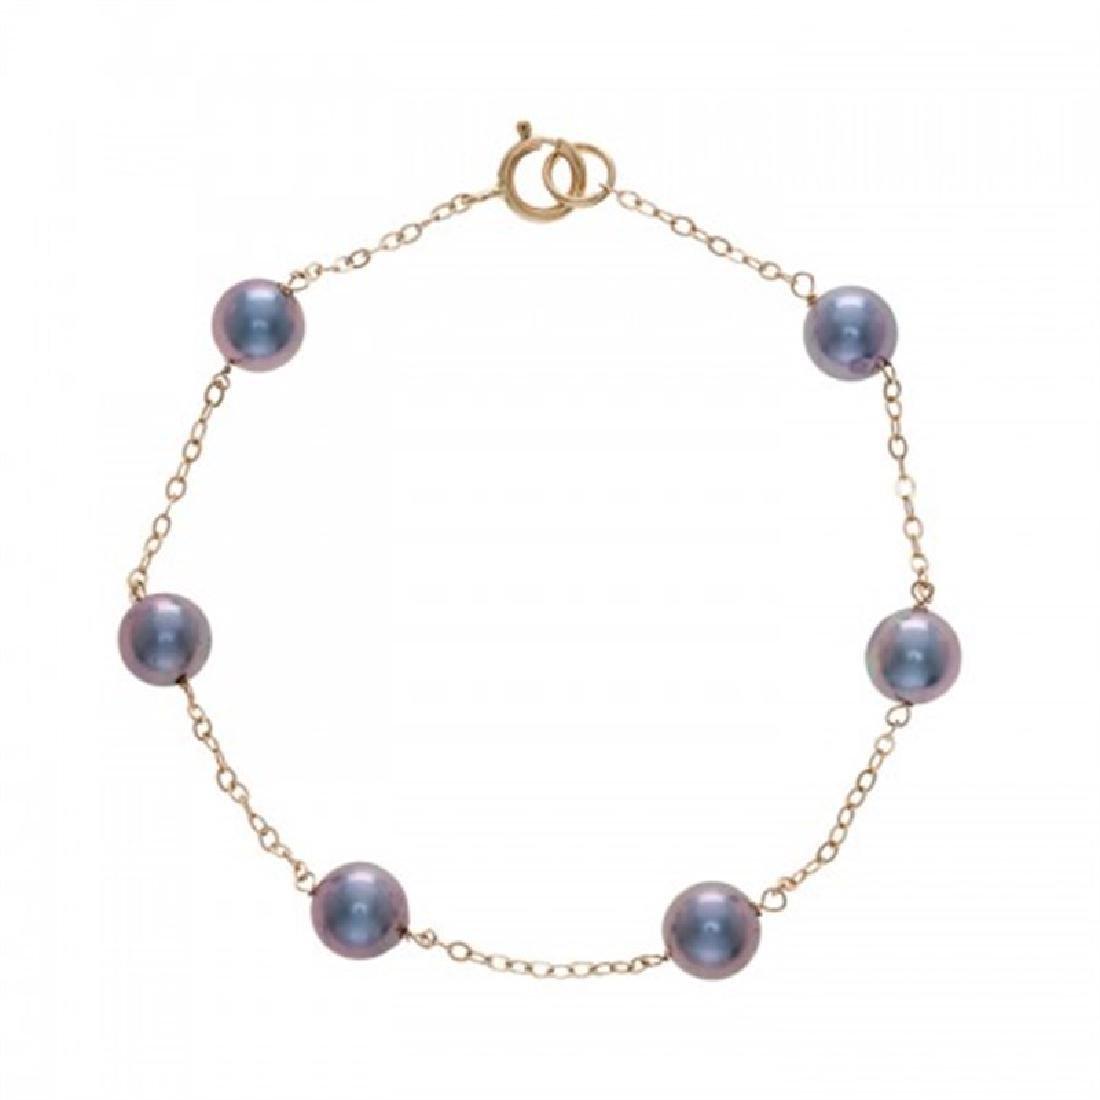 6.0-6.5mm Japanese Akoya Tin Cup Pearl Bracelet